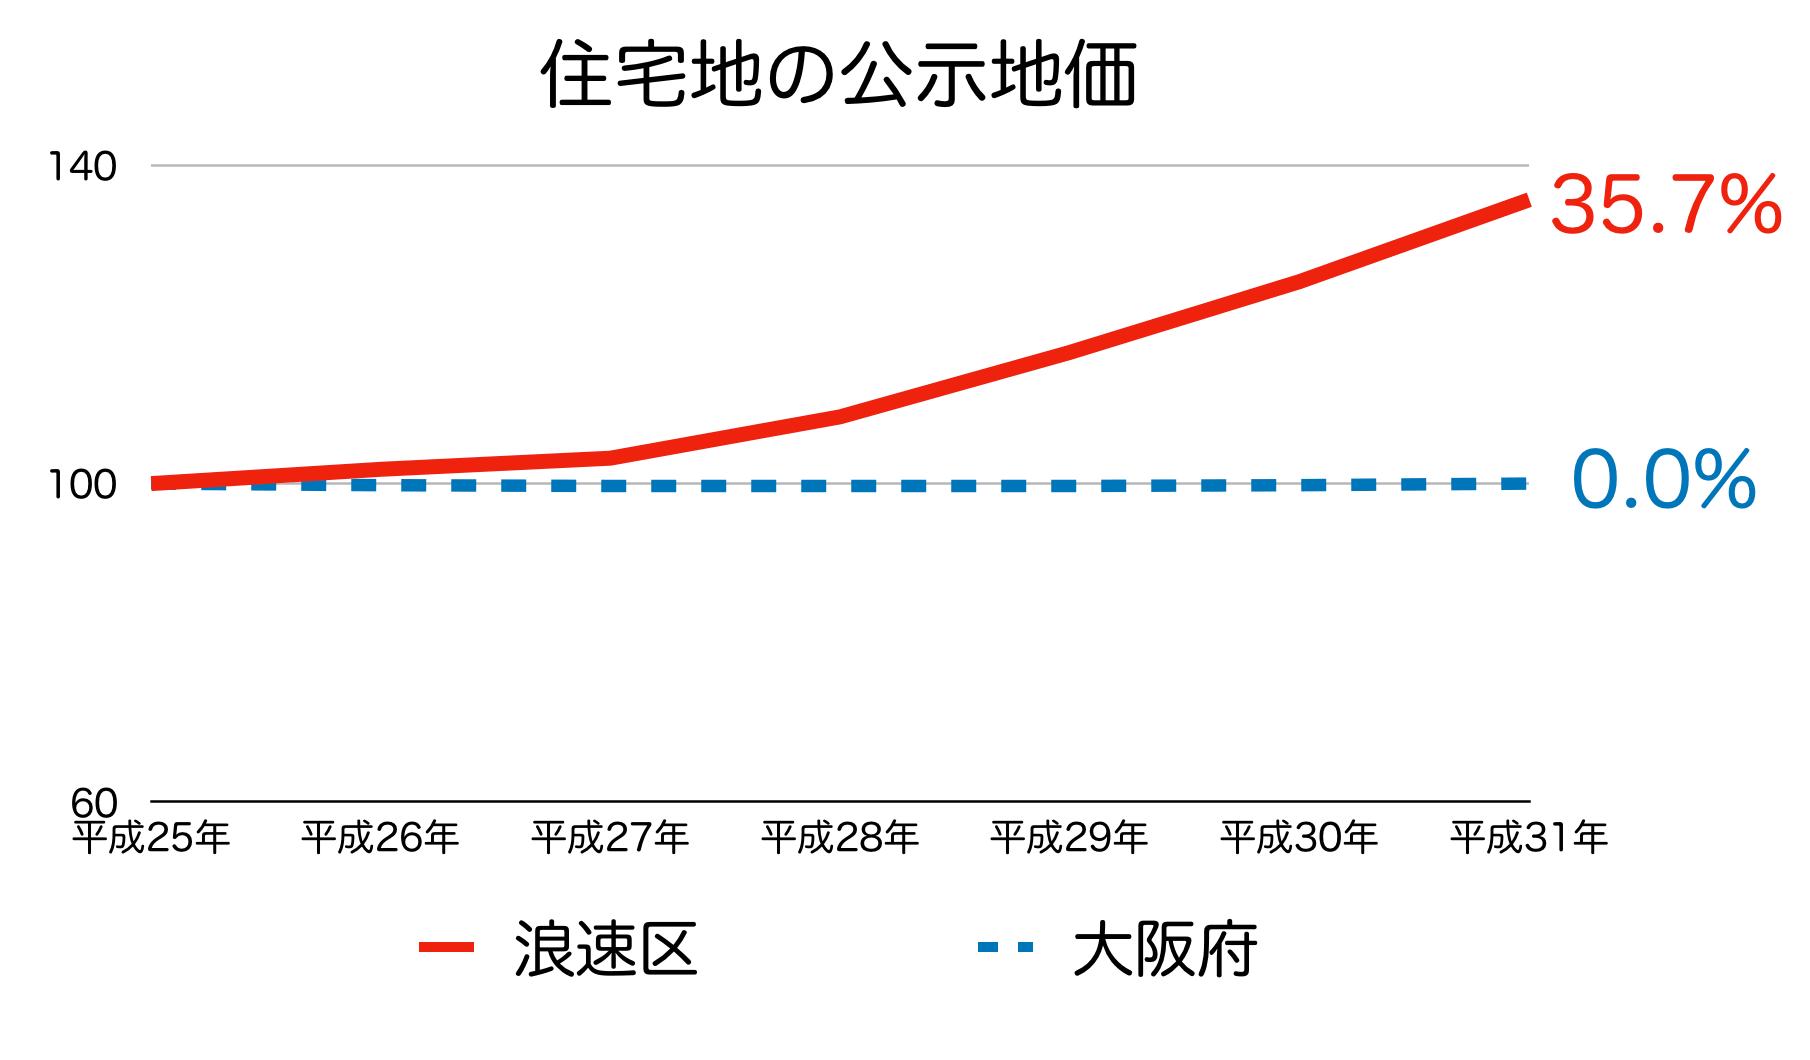 大阪市浪速区の公示地価 H25-H31